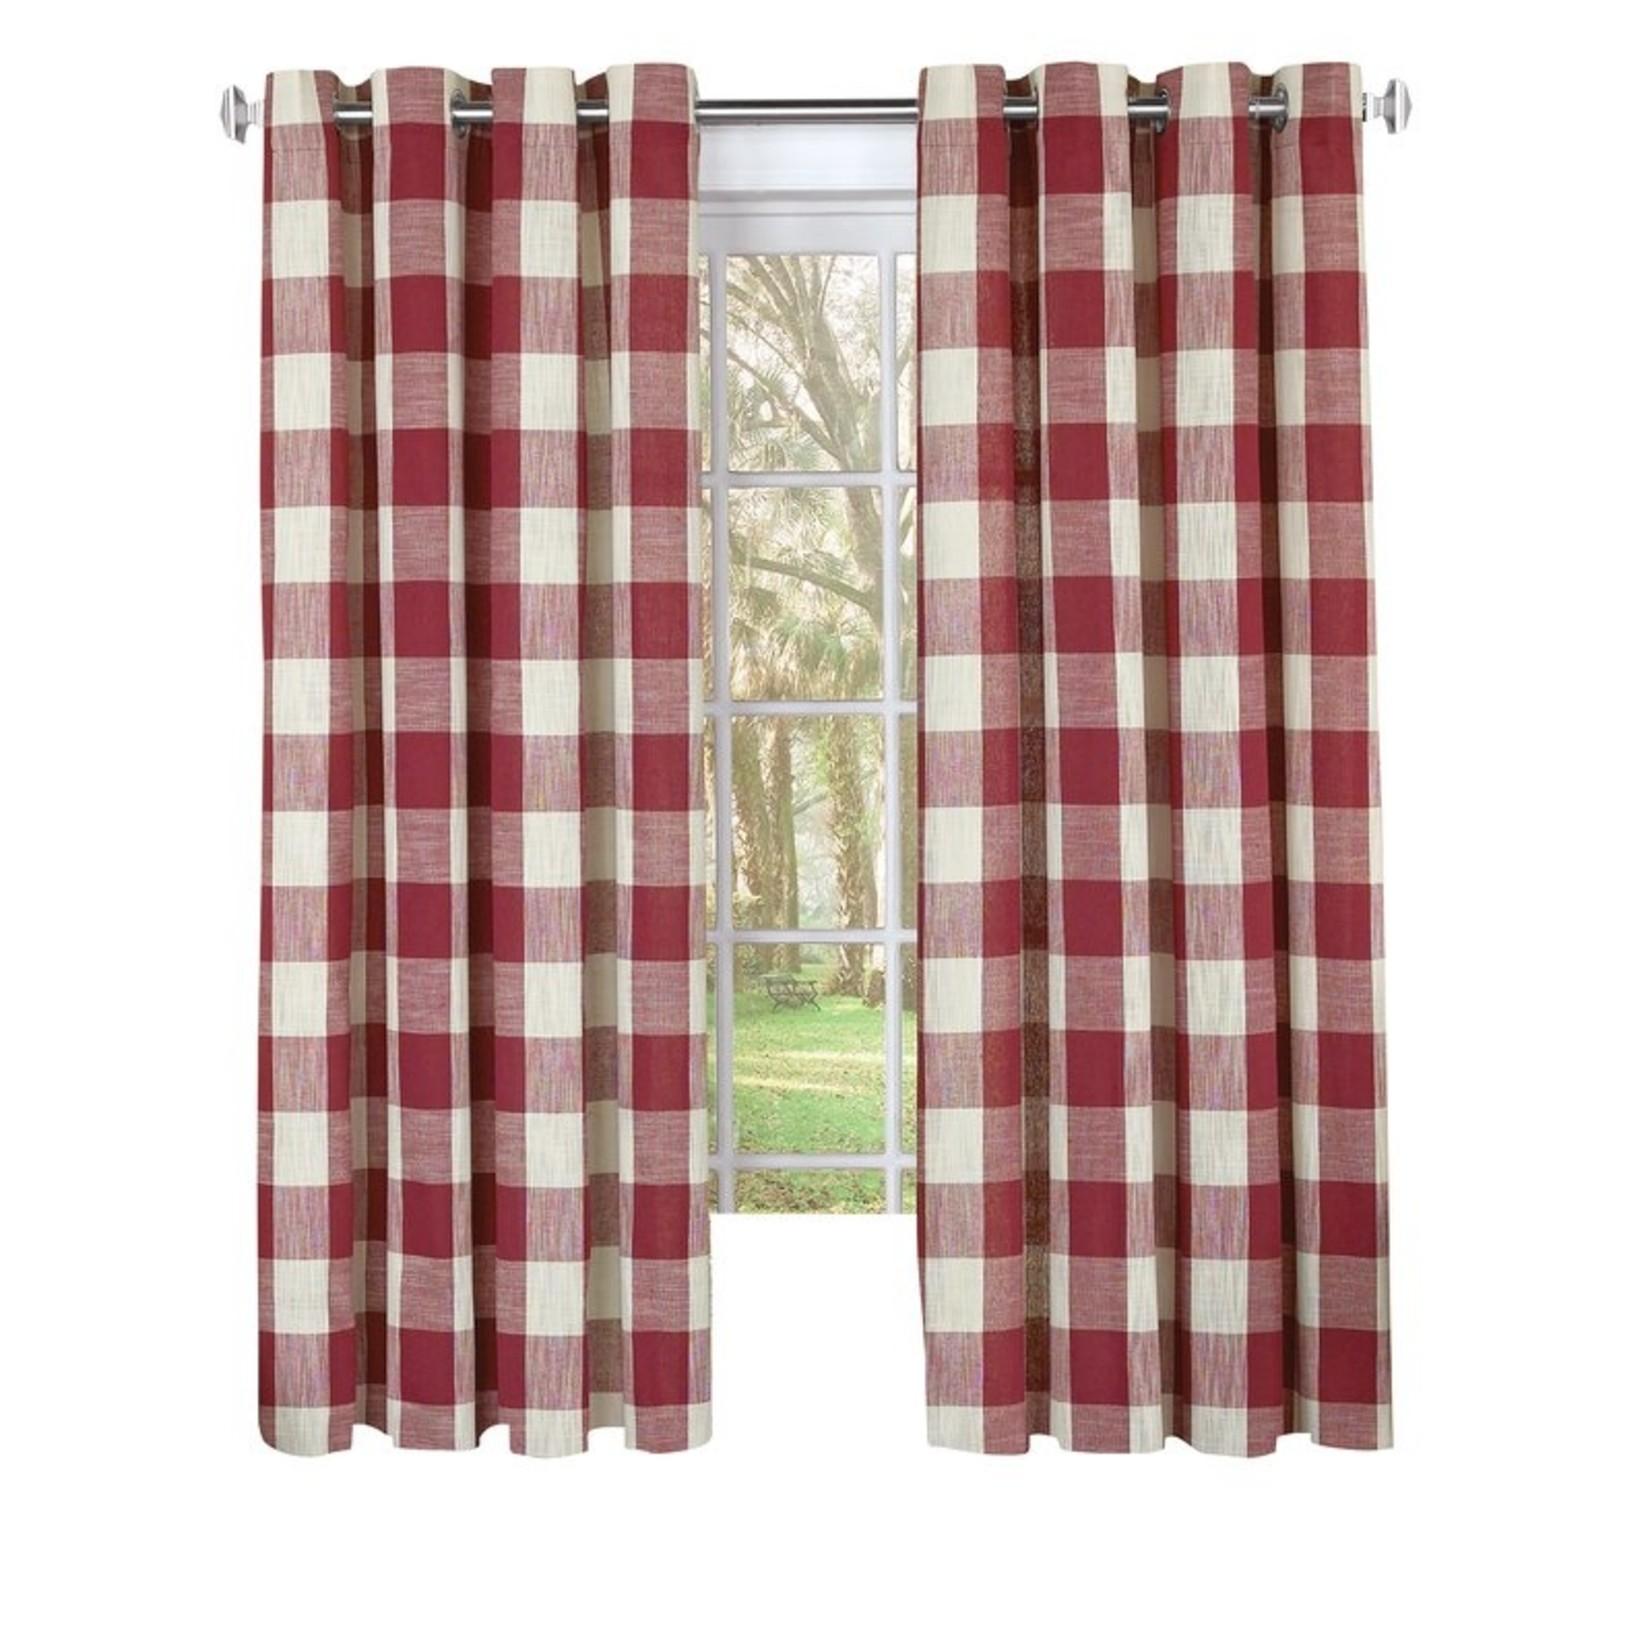 "* 53"" x 63"" - Stylish Checkered Room Darkening Grommet Single Curtain Panel"